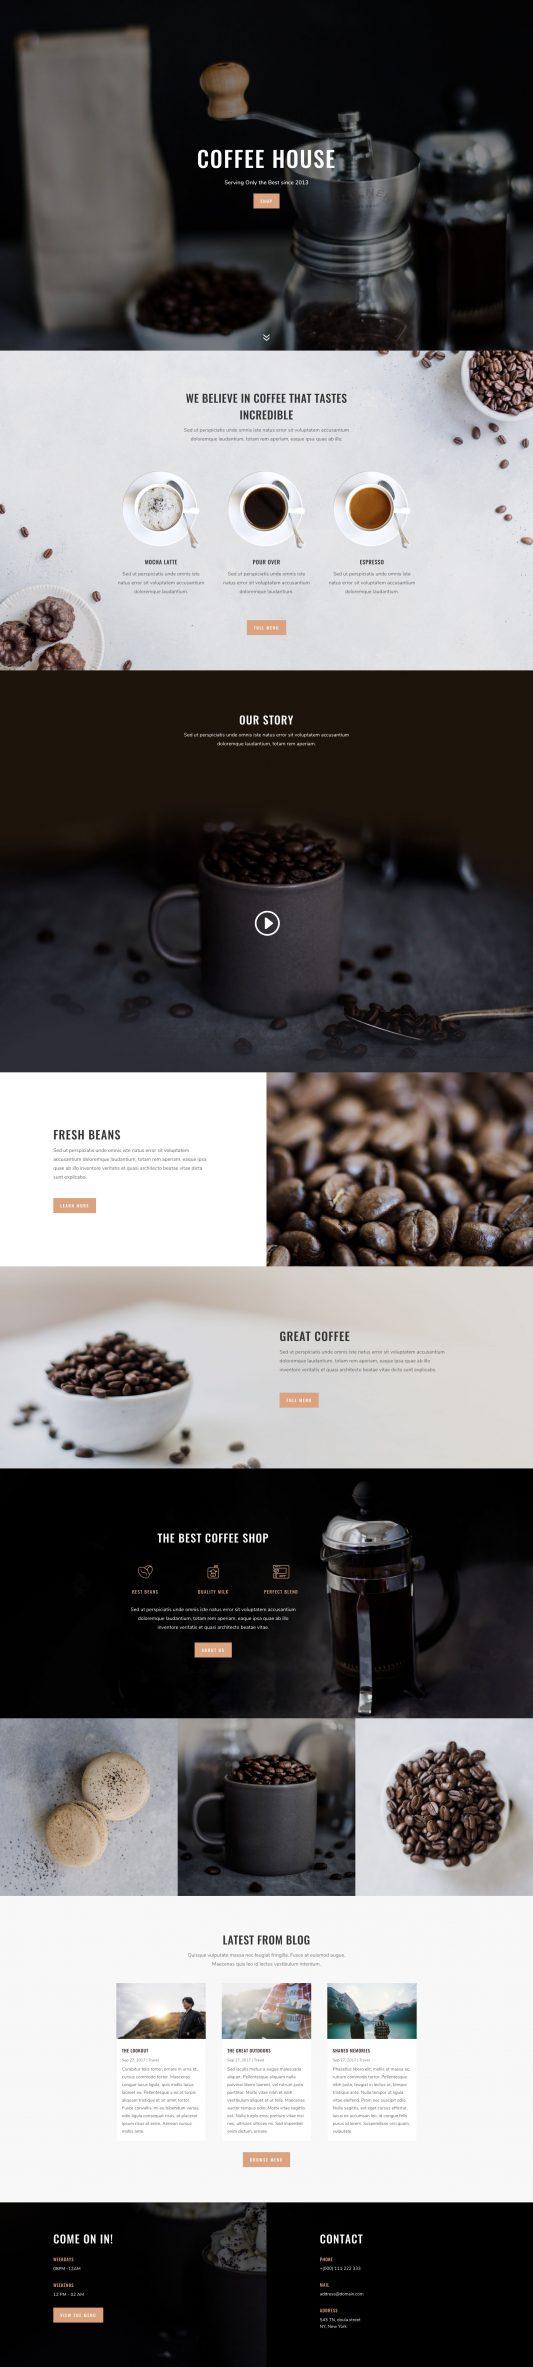 Elegant Themes - Divi-coffee-shop-landing-533x2367